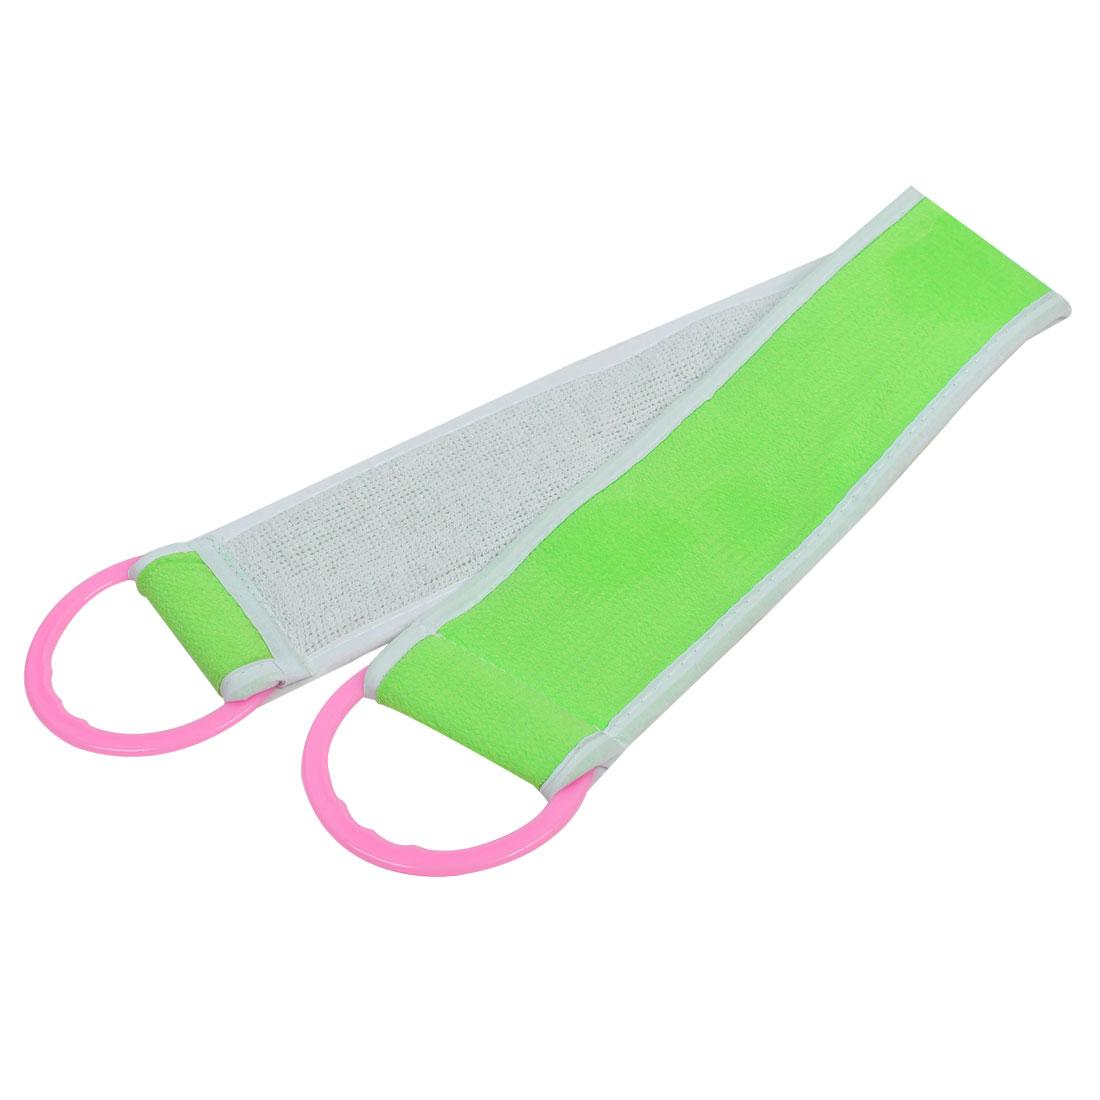 Home Bathroom Shower Cleaning Tool Body Bath Scrub Massage Towel Light Green